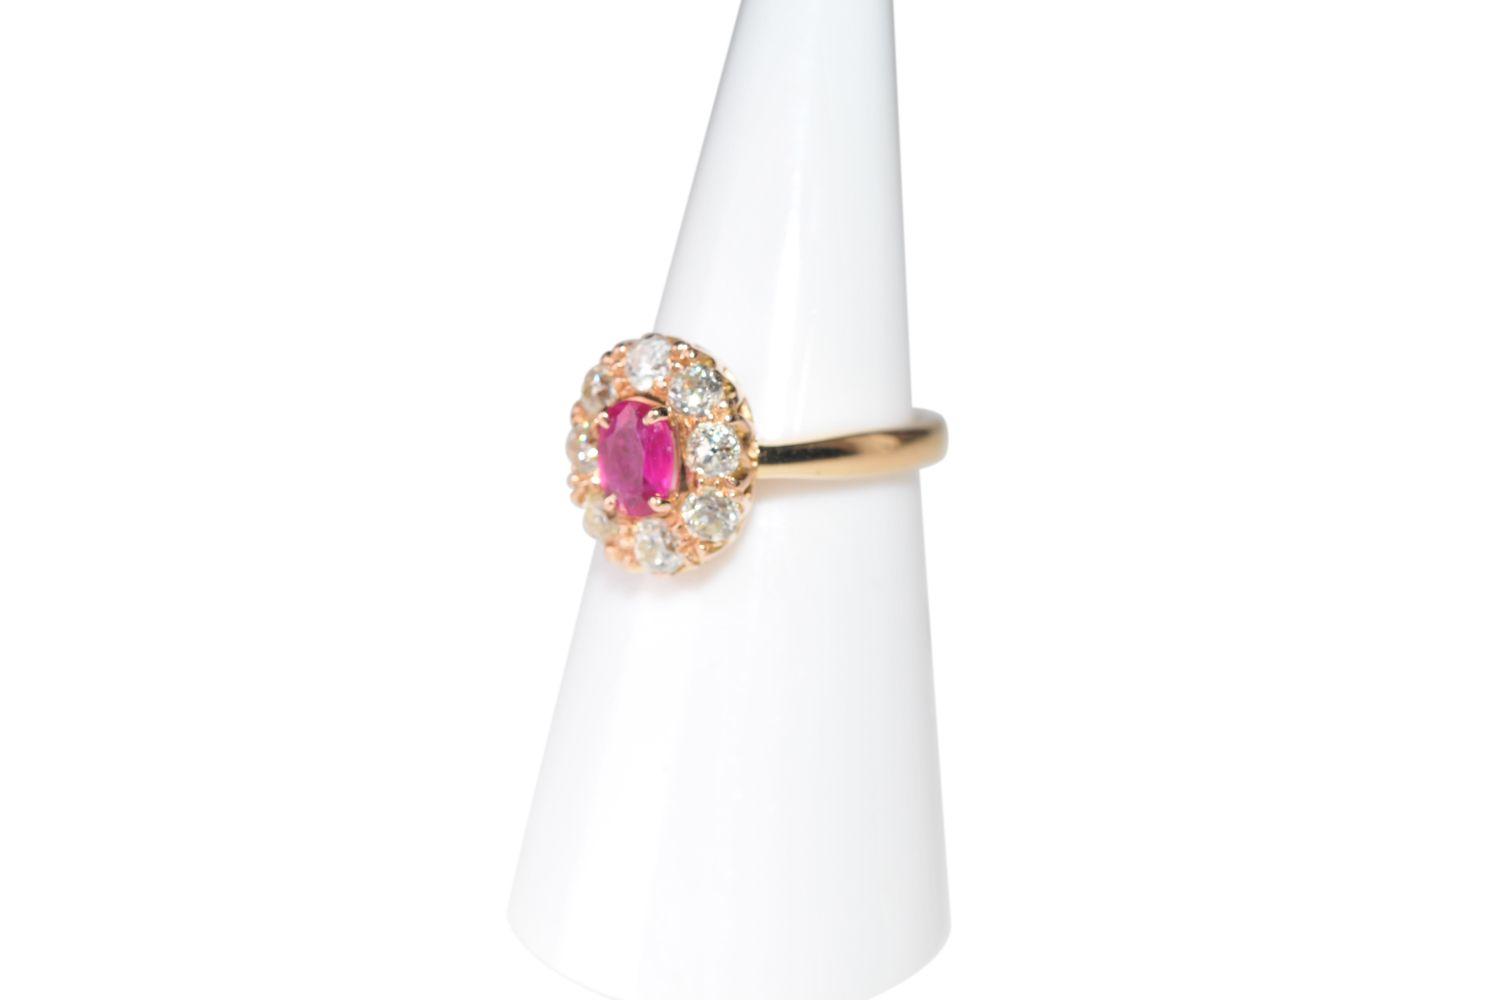 #127 Brilliant ring with ruby untreated | Brillantring mit Rubin unbehandelt Image